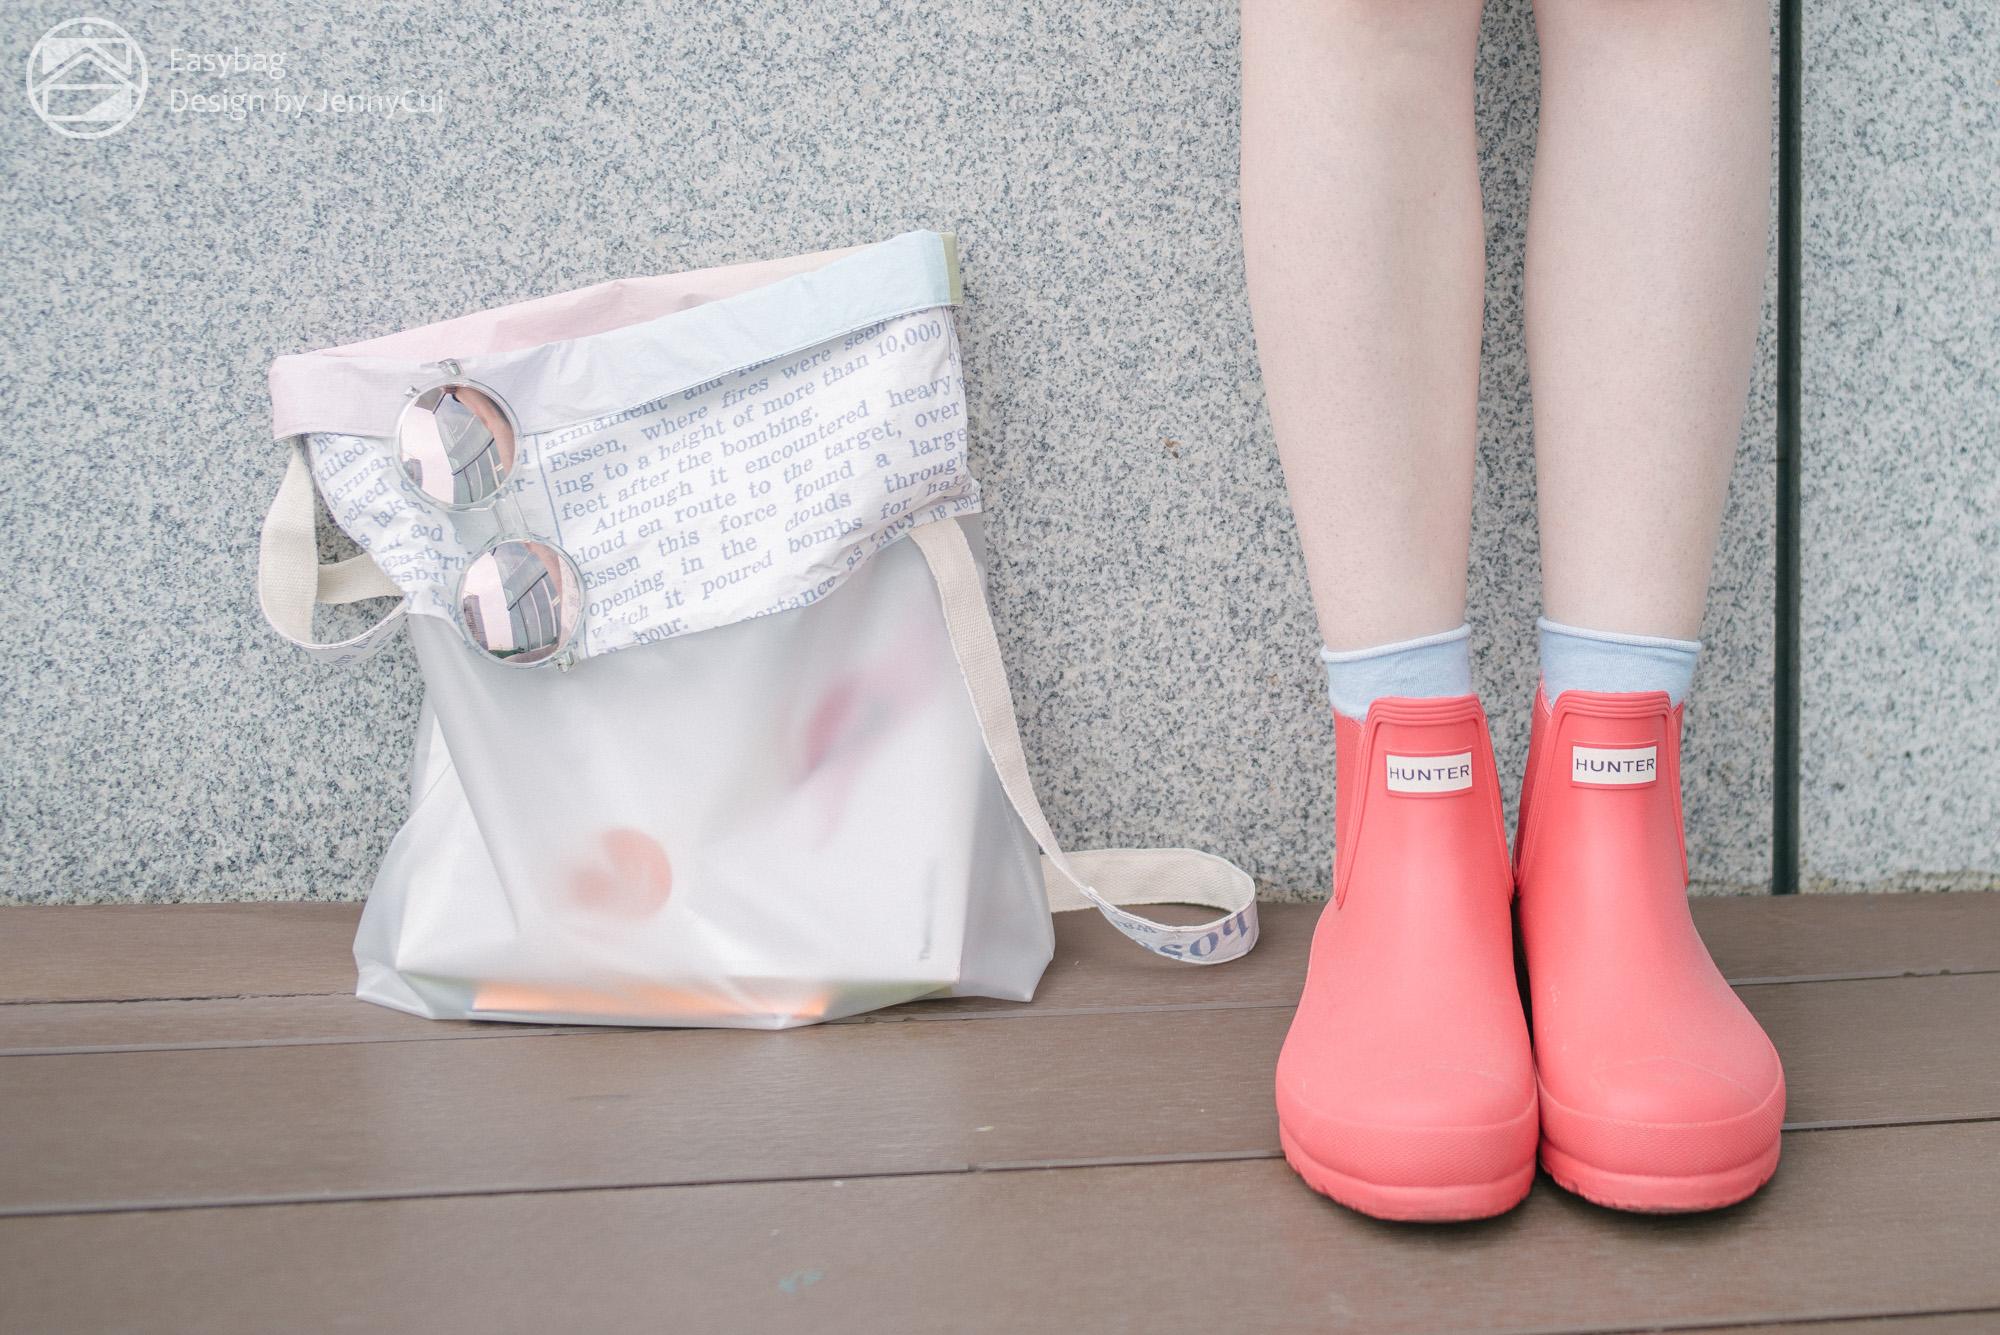 周杰伦新歌火爆全网,Easy Bag 也来热身!